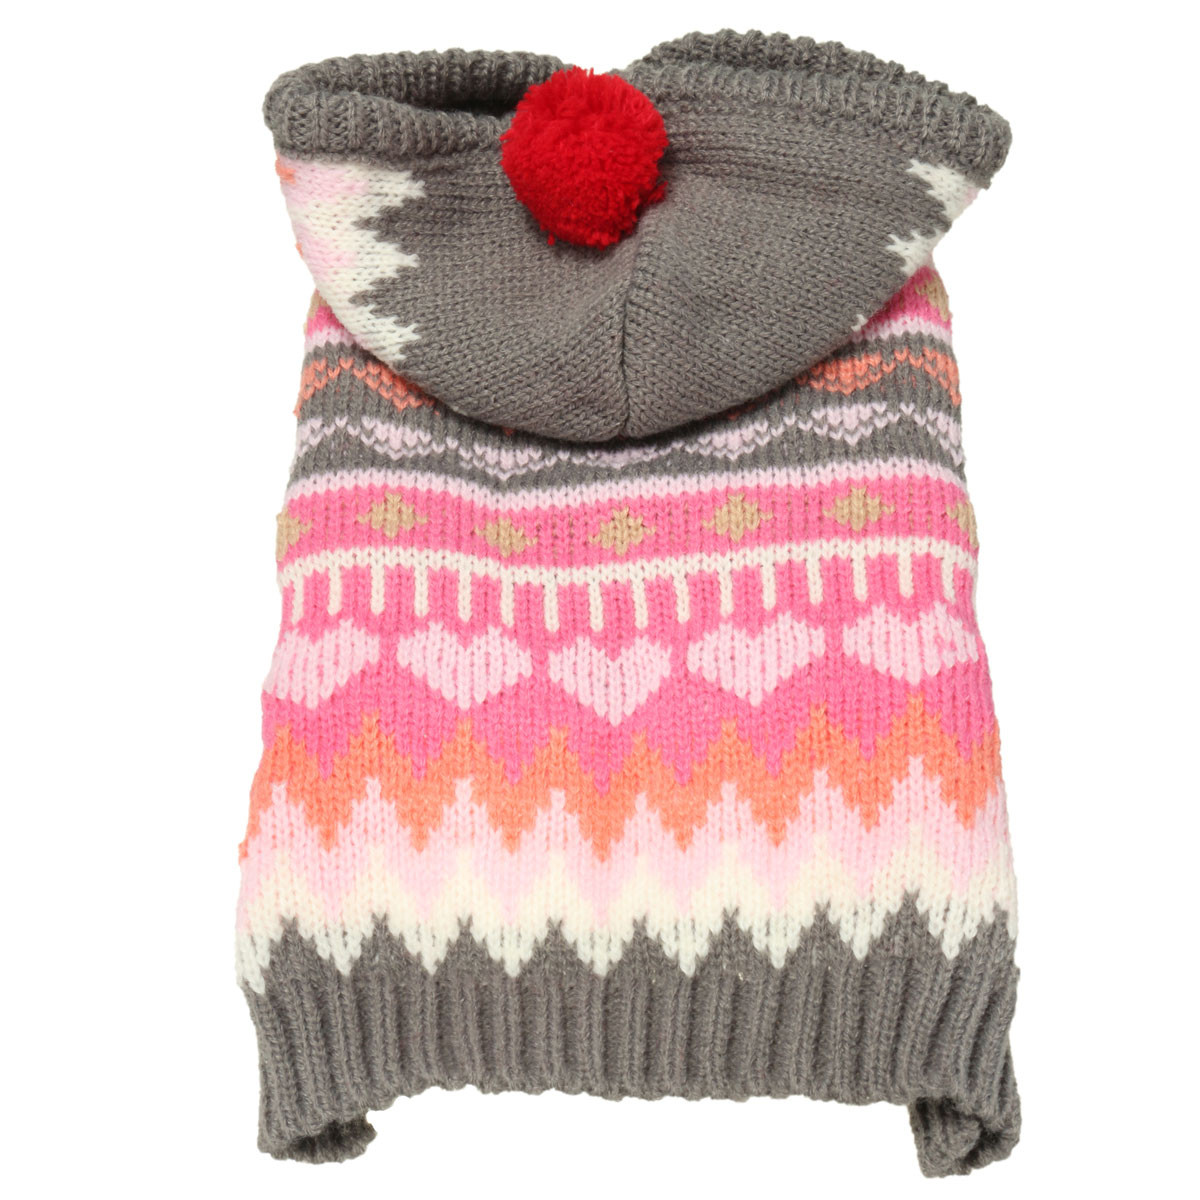 Pet Dog Cat Snowflake Sweater Winter Warm Coat Jacket Clothes Vest Costume Jacket Hat Apparel Hoodie